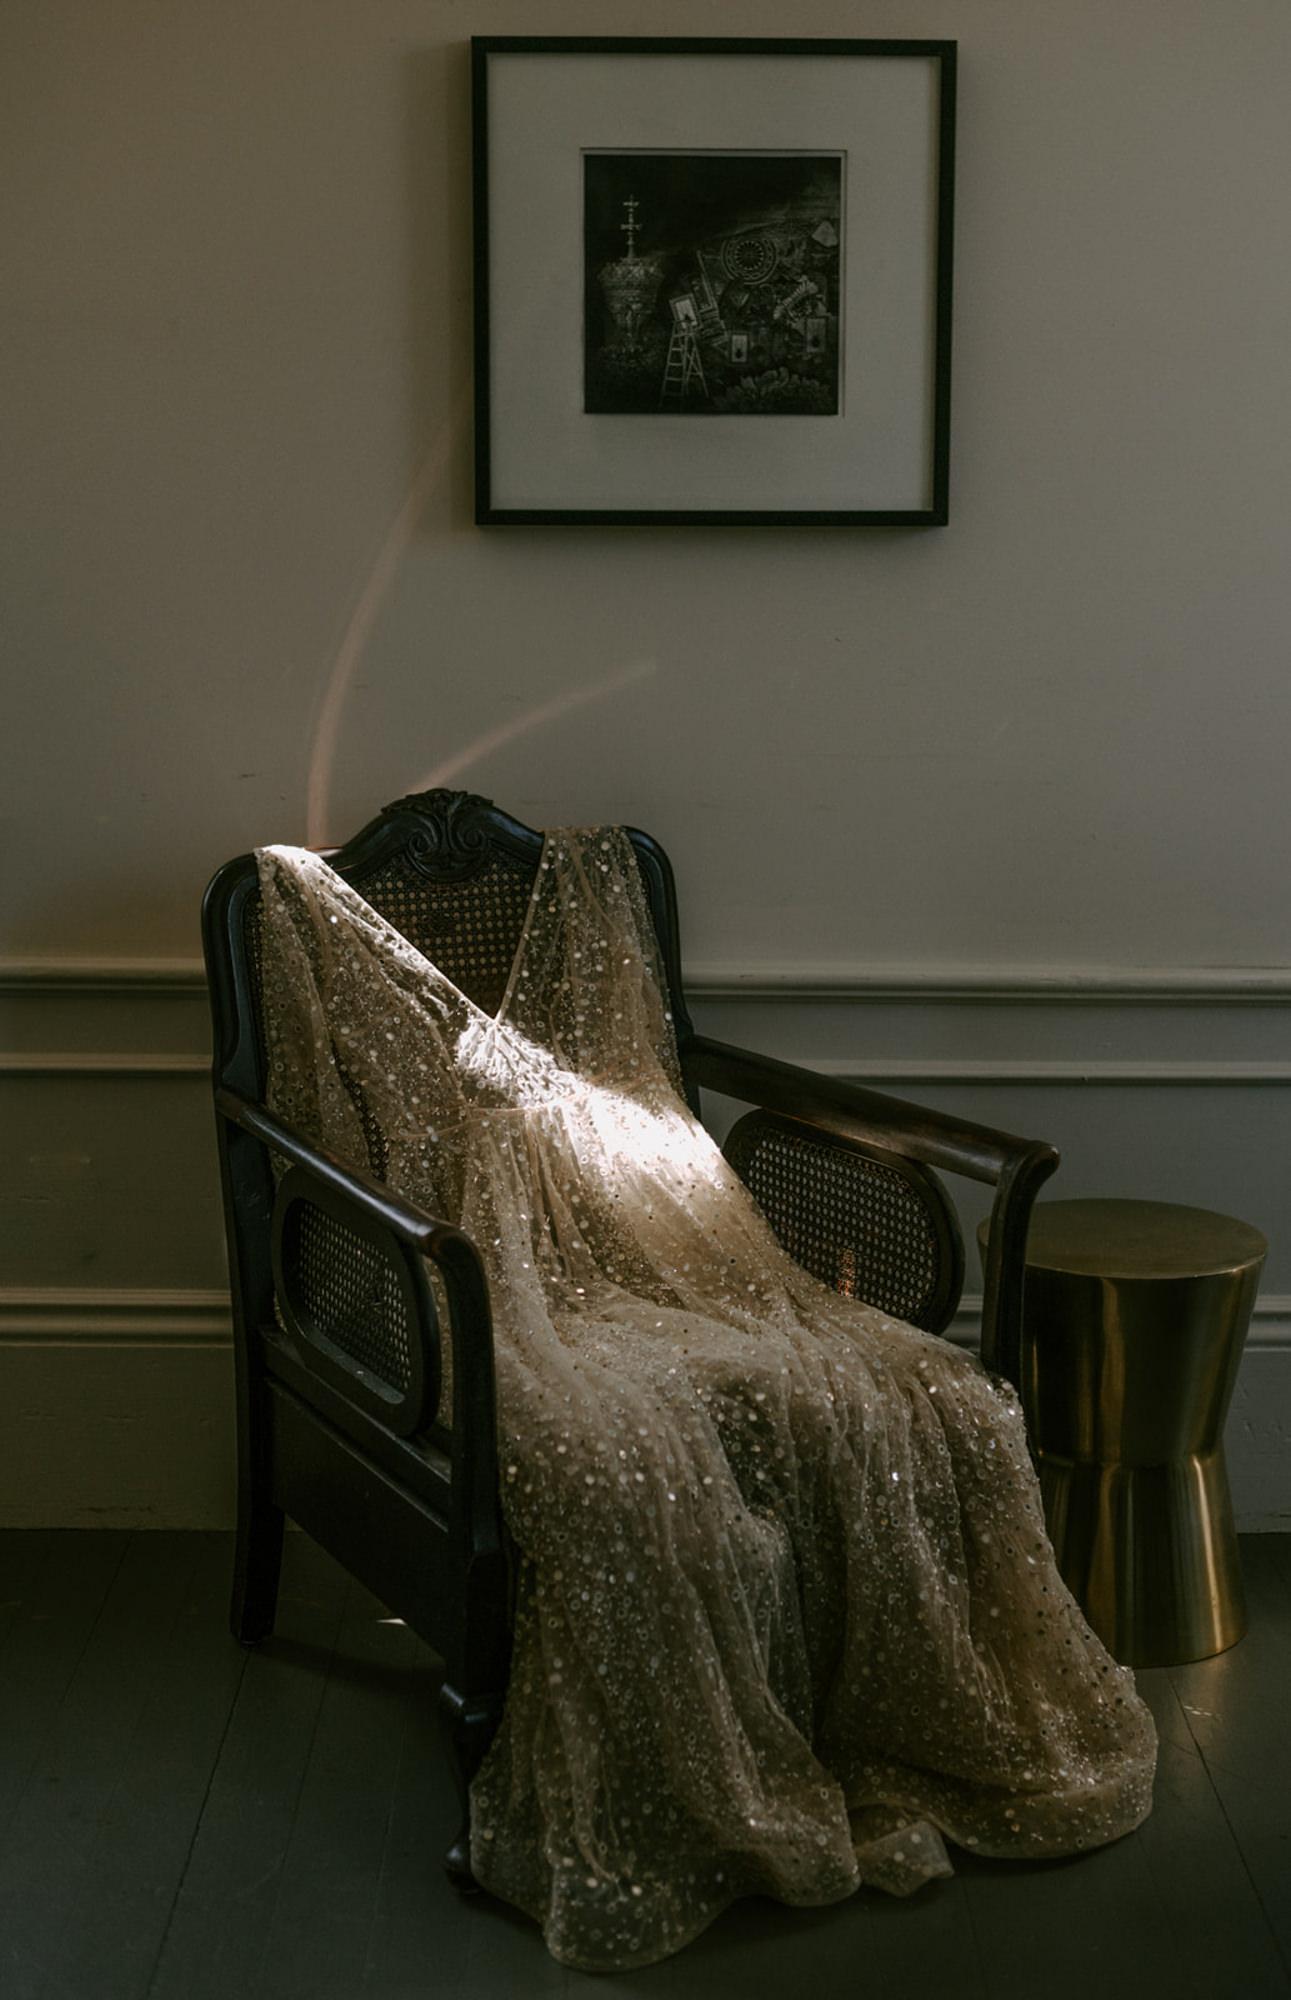 Sparkley wedding dress laying in windowlight - photo by Kristen Marie Parker